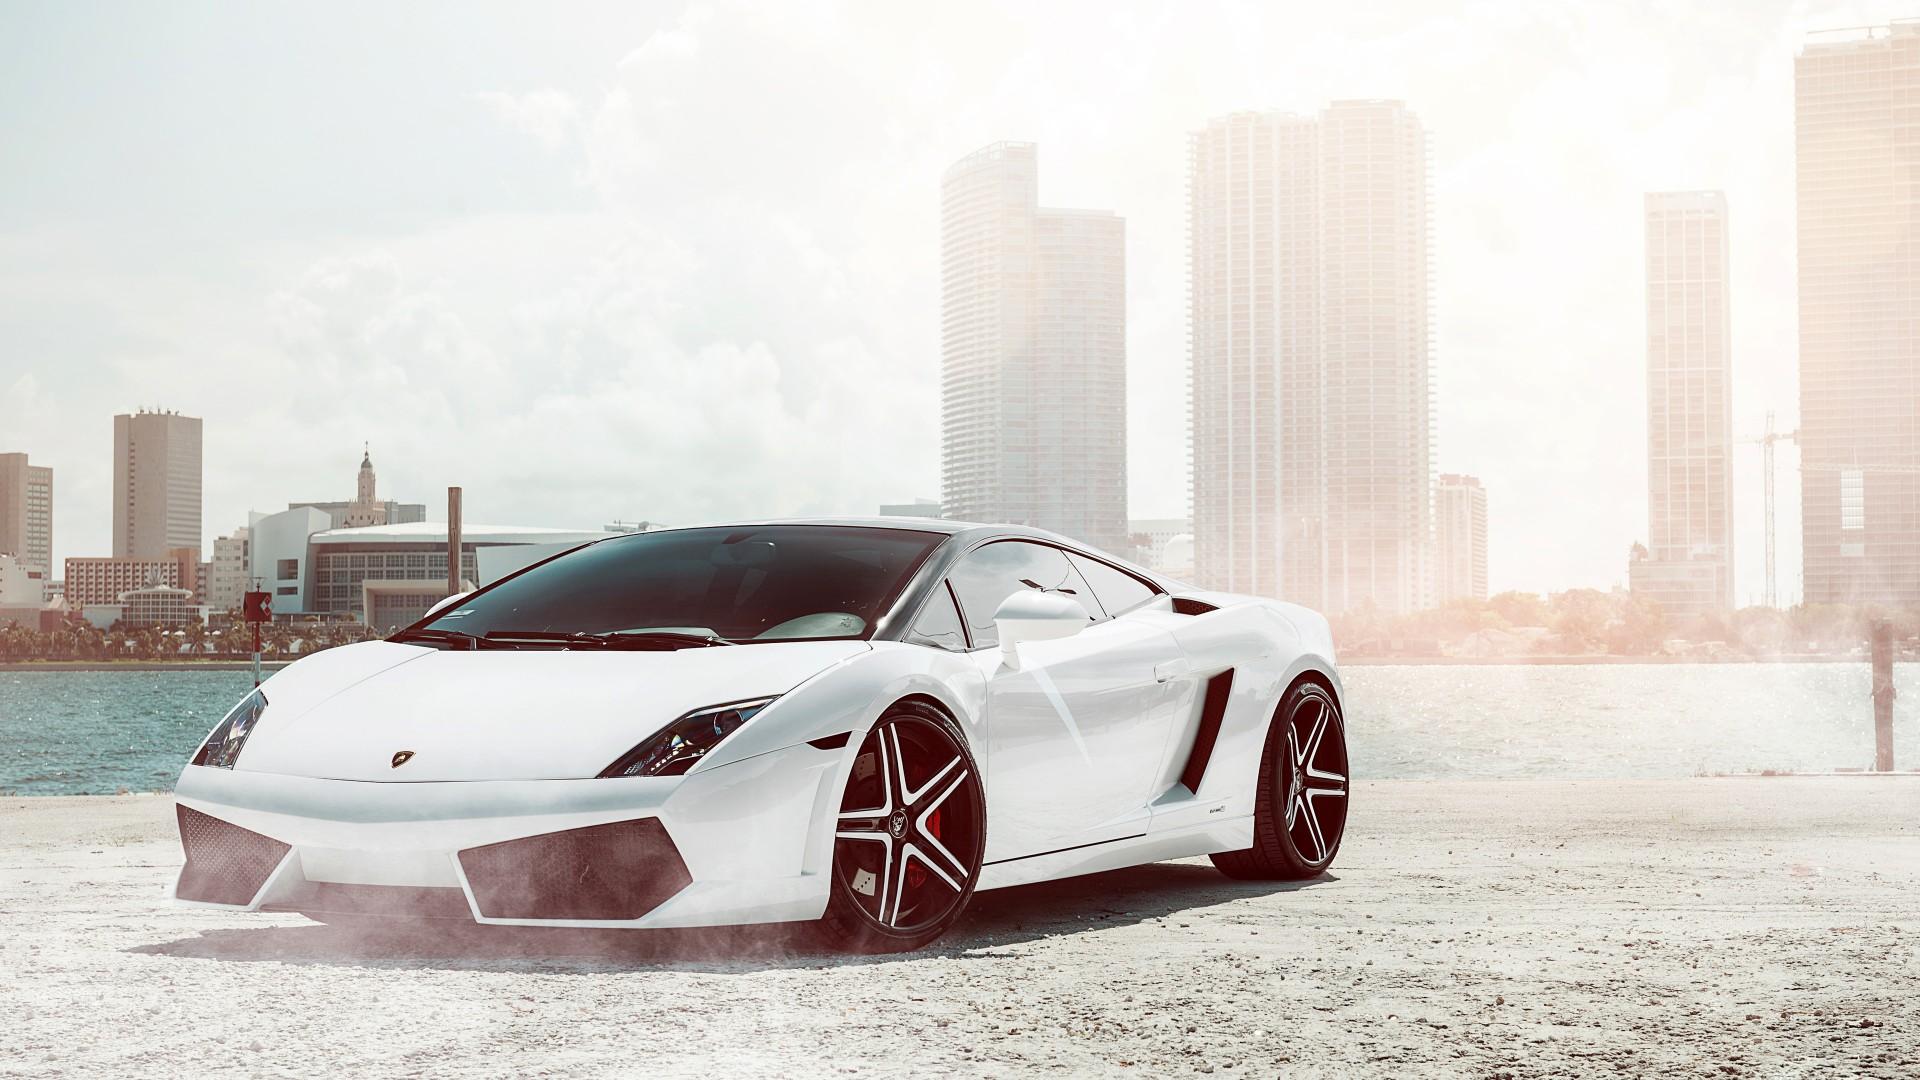 Lamborghini Aventador Green 4k Hd Cars 4k Wallpapers: Lamborghini Gallardo White Wallpaper